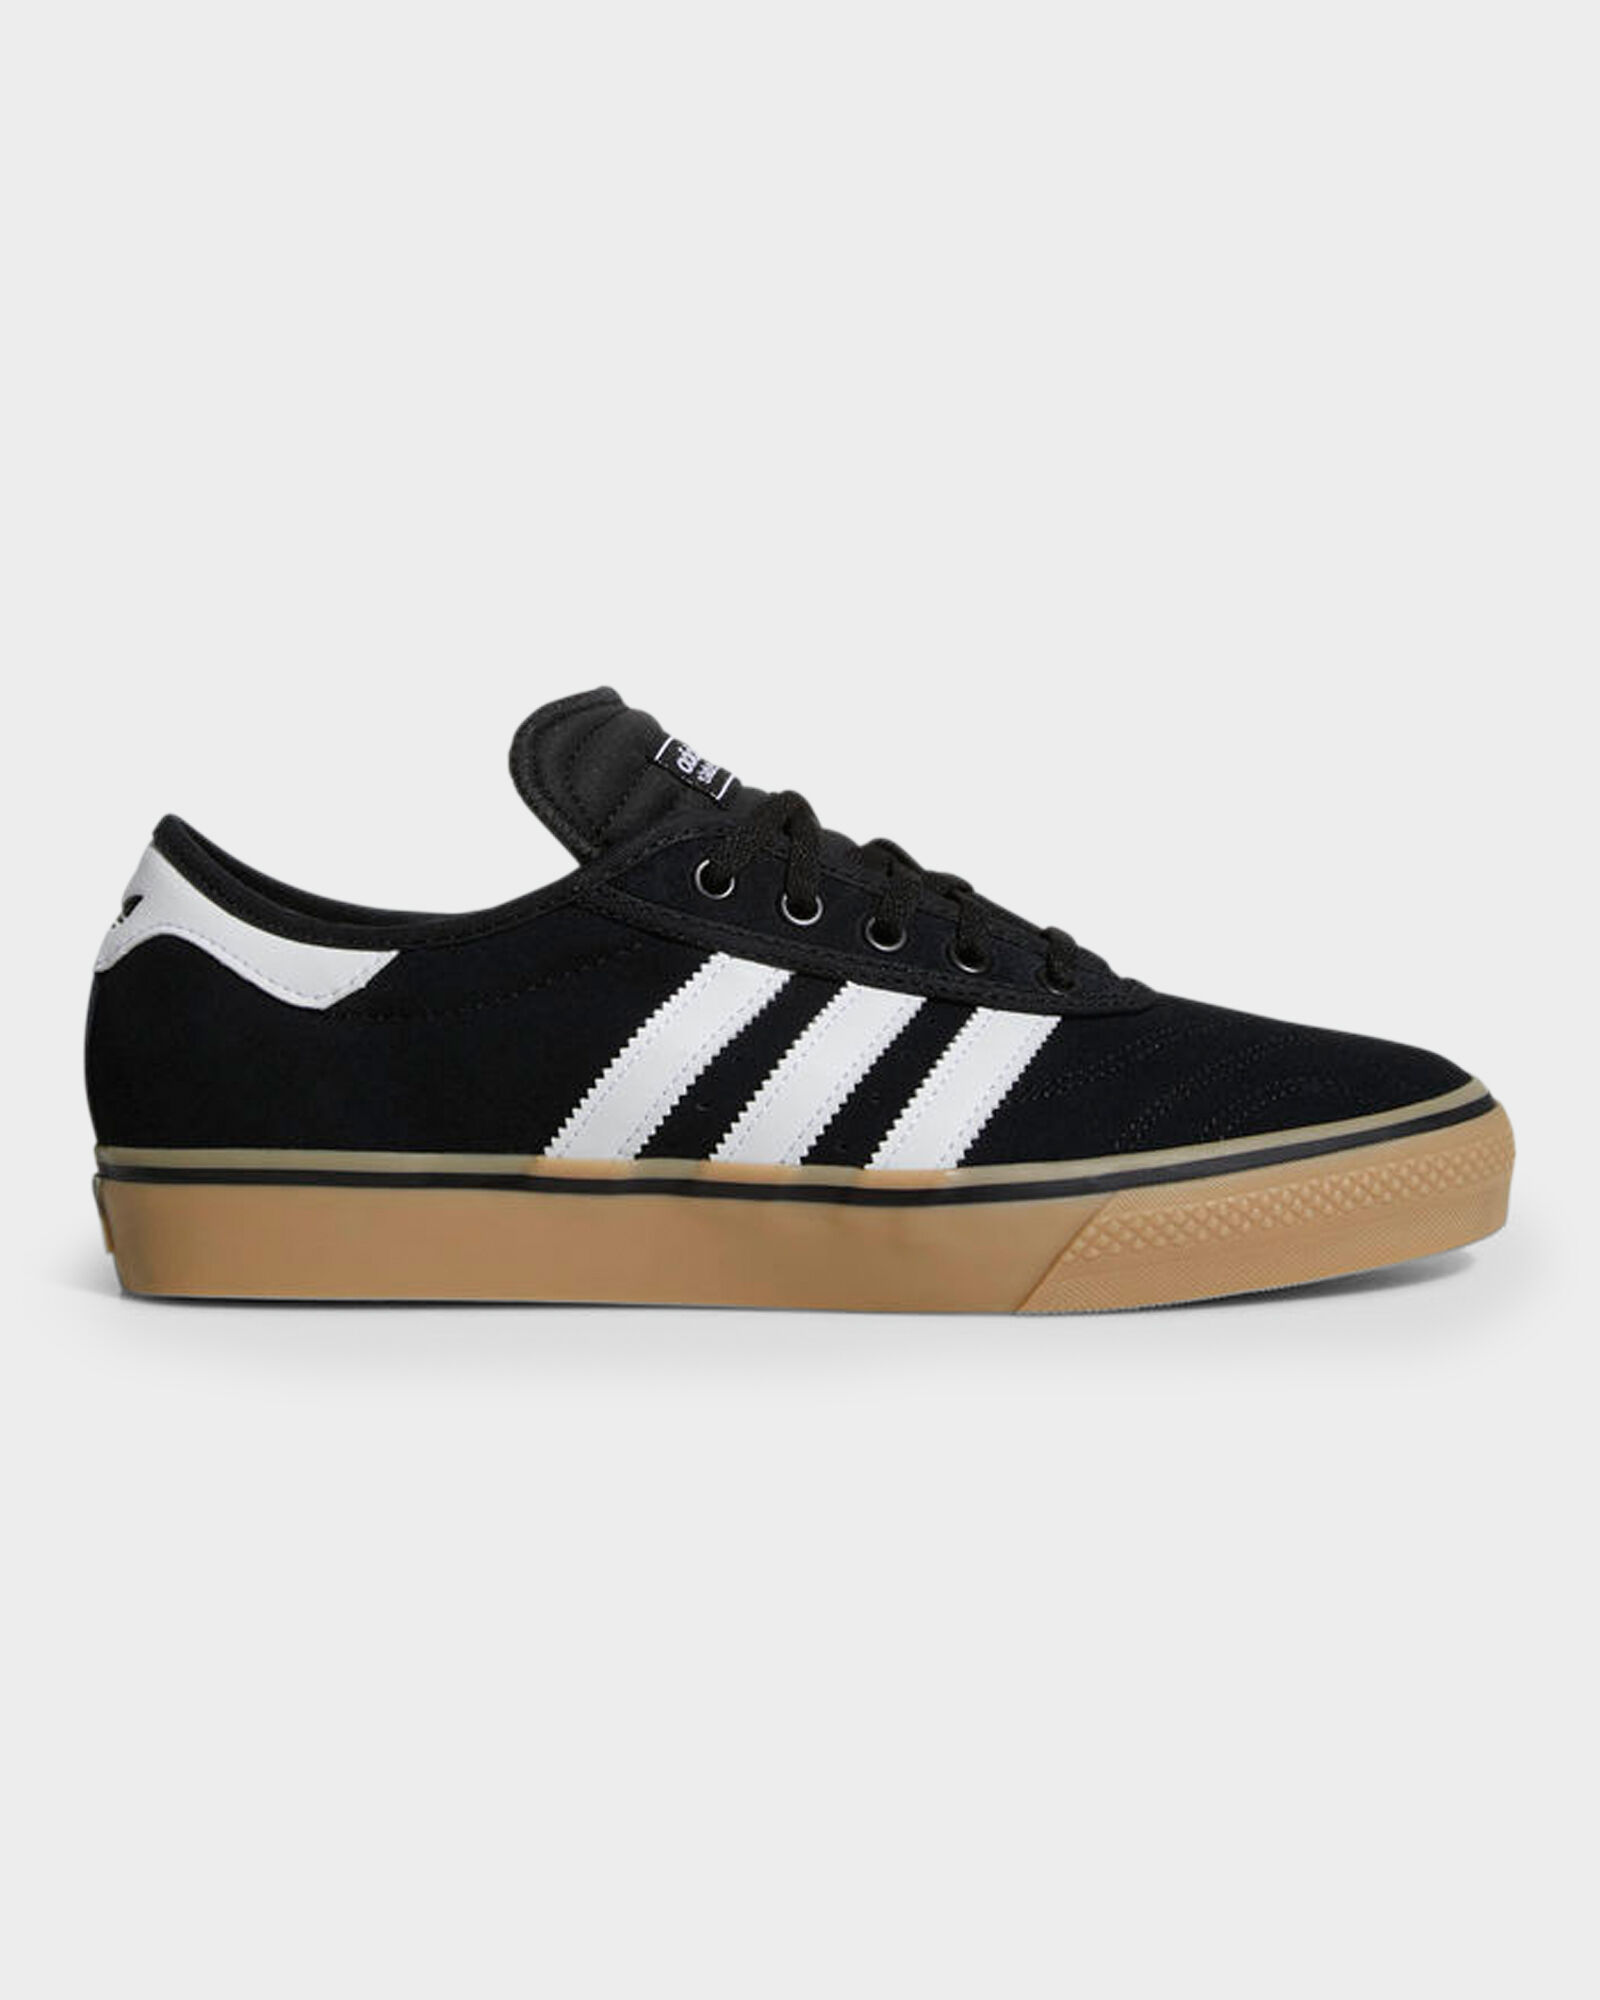 Adidas Adi Ease Premiere Skateboard Shoe GreyBlackWhite